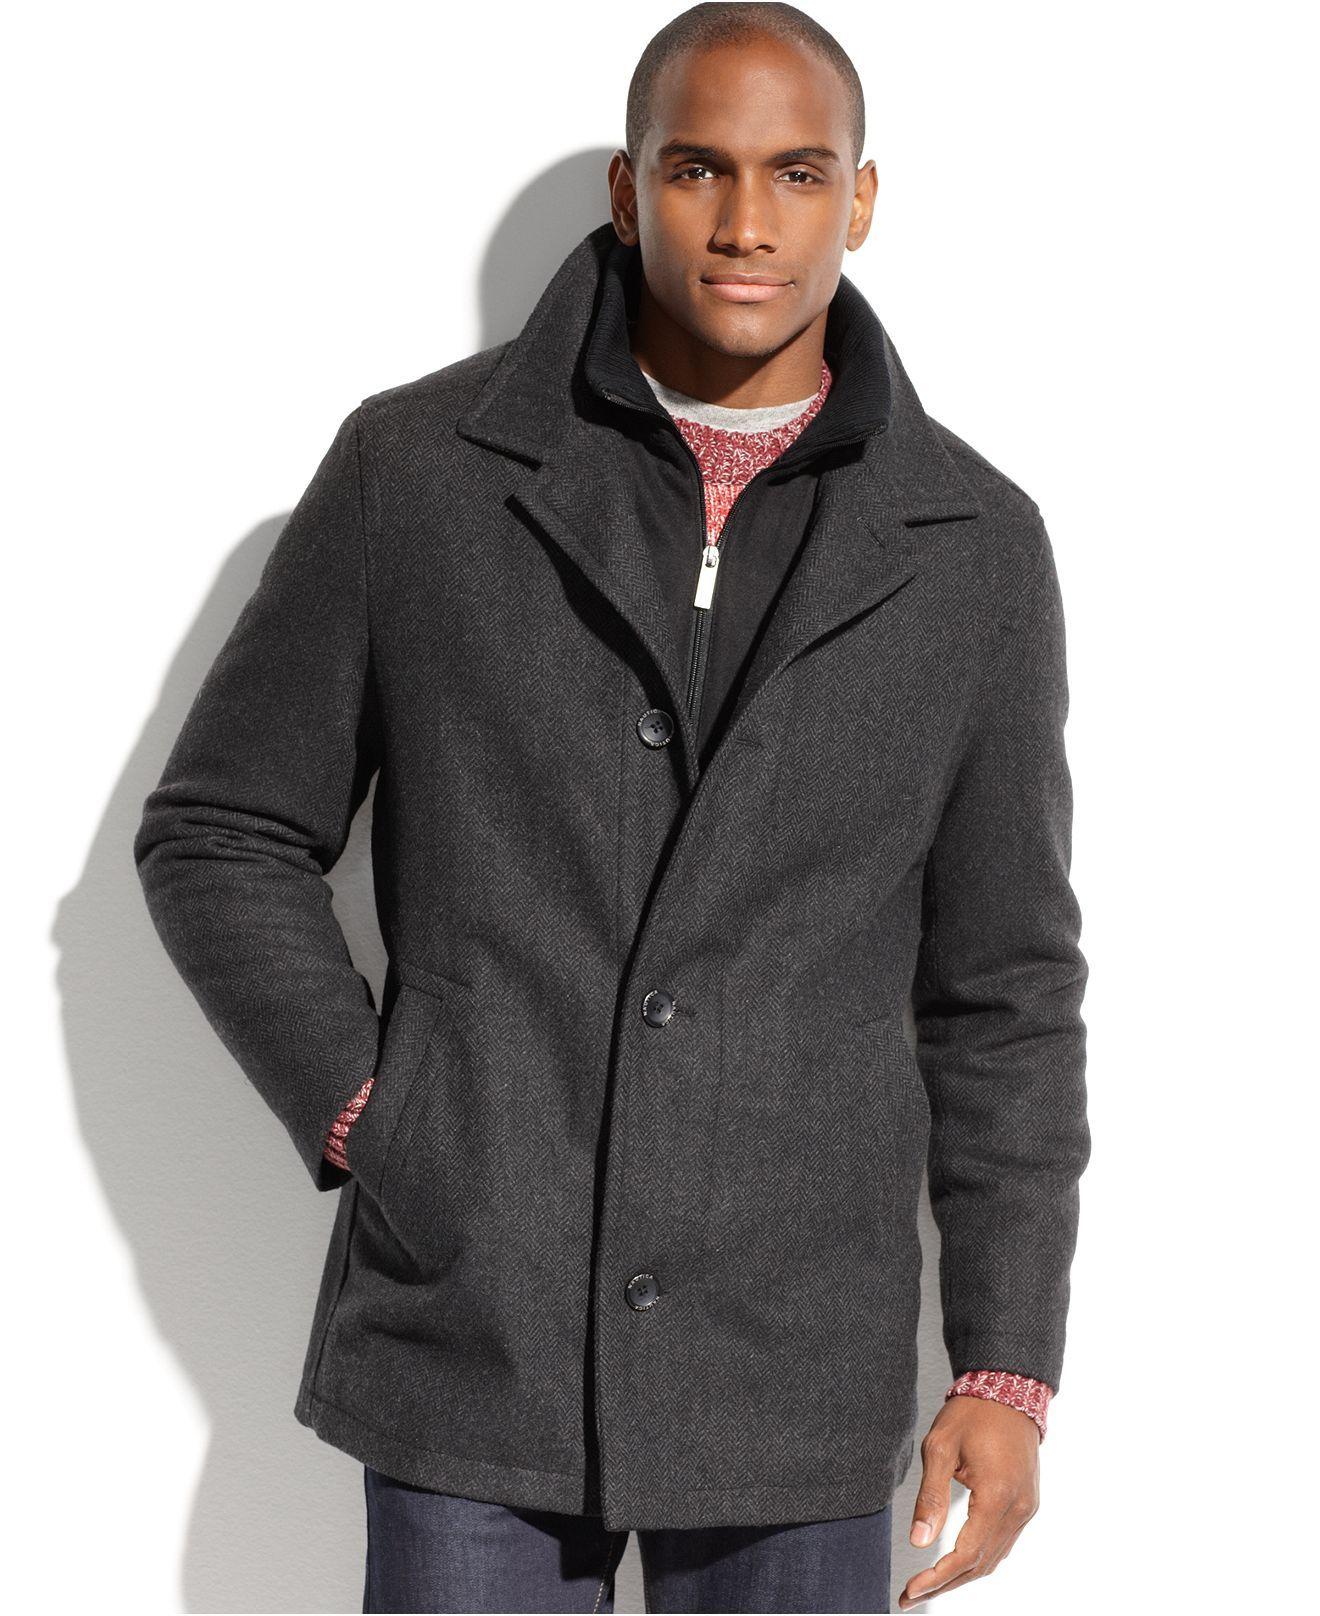 Nautica Coat Wool Blend Wind And Water Resistant Car Coat Nautica Outerwear Men Macy S Car Coat Men S Coats And Jackets Coat [ 1616 x 1320 Pixel ]